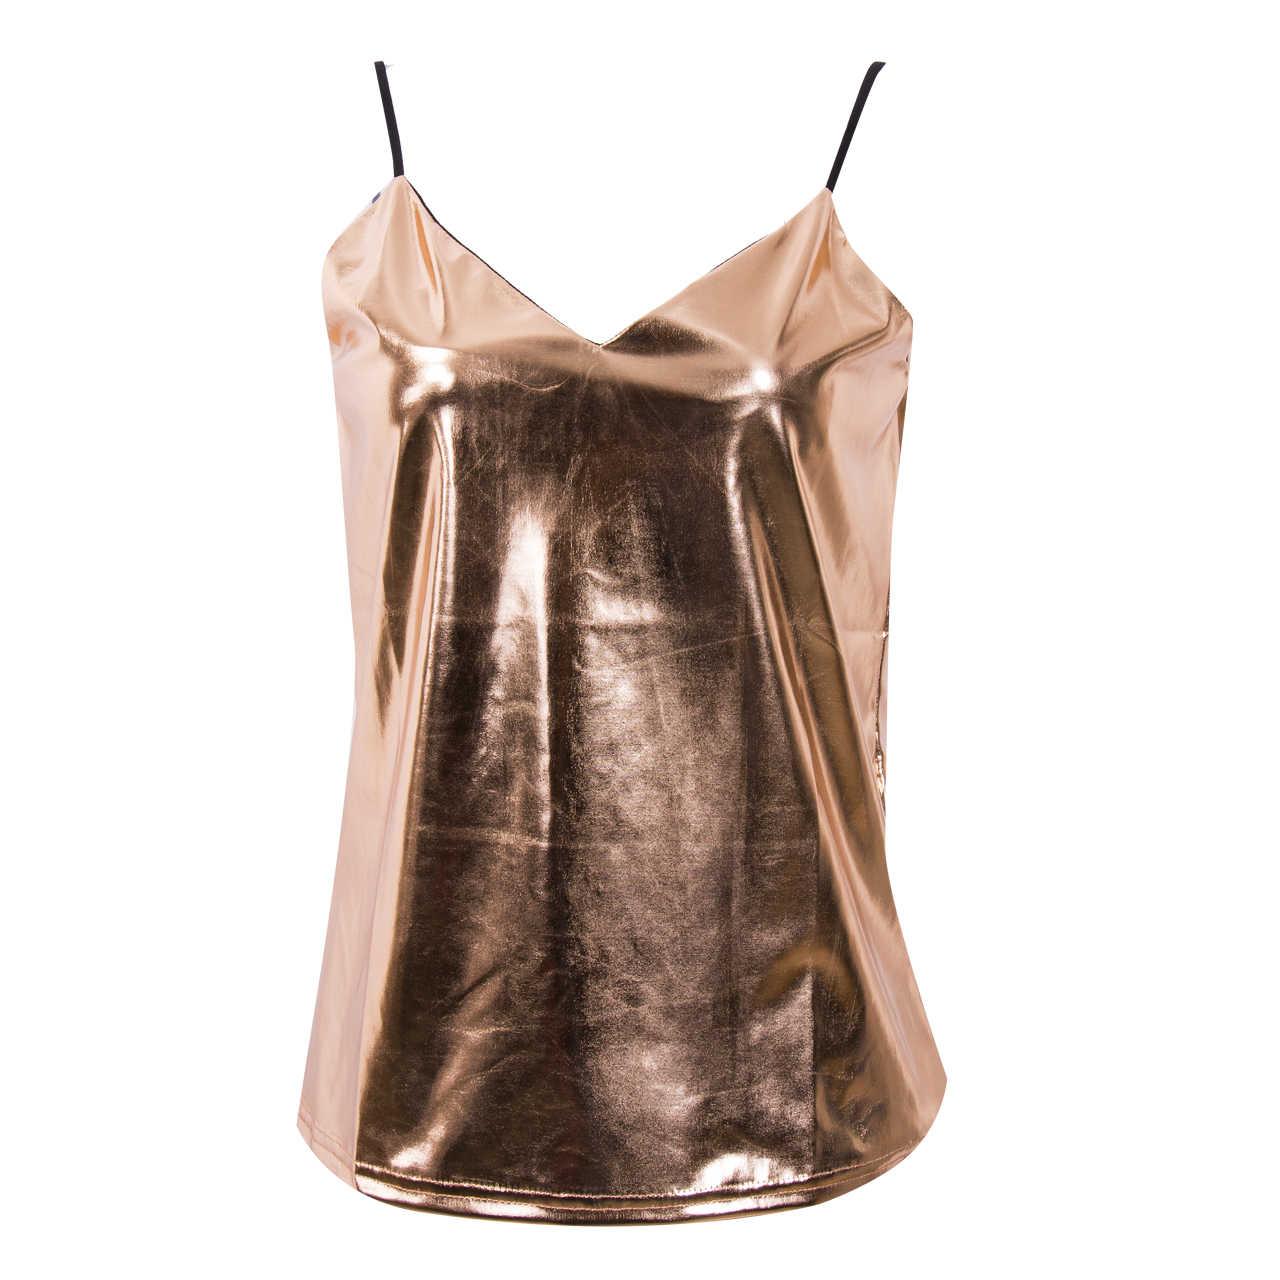 Gorące kobiety Sexy złoto srebro topy lato stałe Camis Sexy V Neck Brandy Melville bez rękawów Camisole Spaghetti pasek Bralette